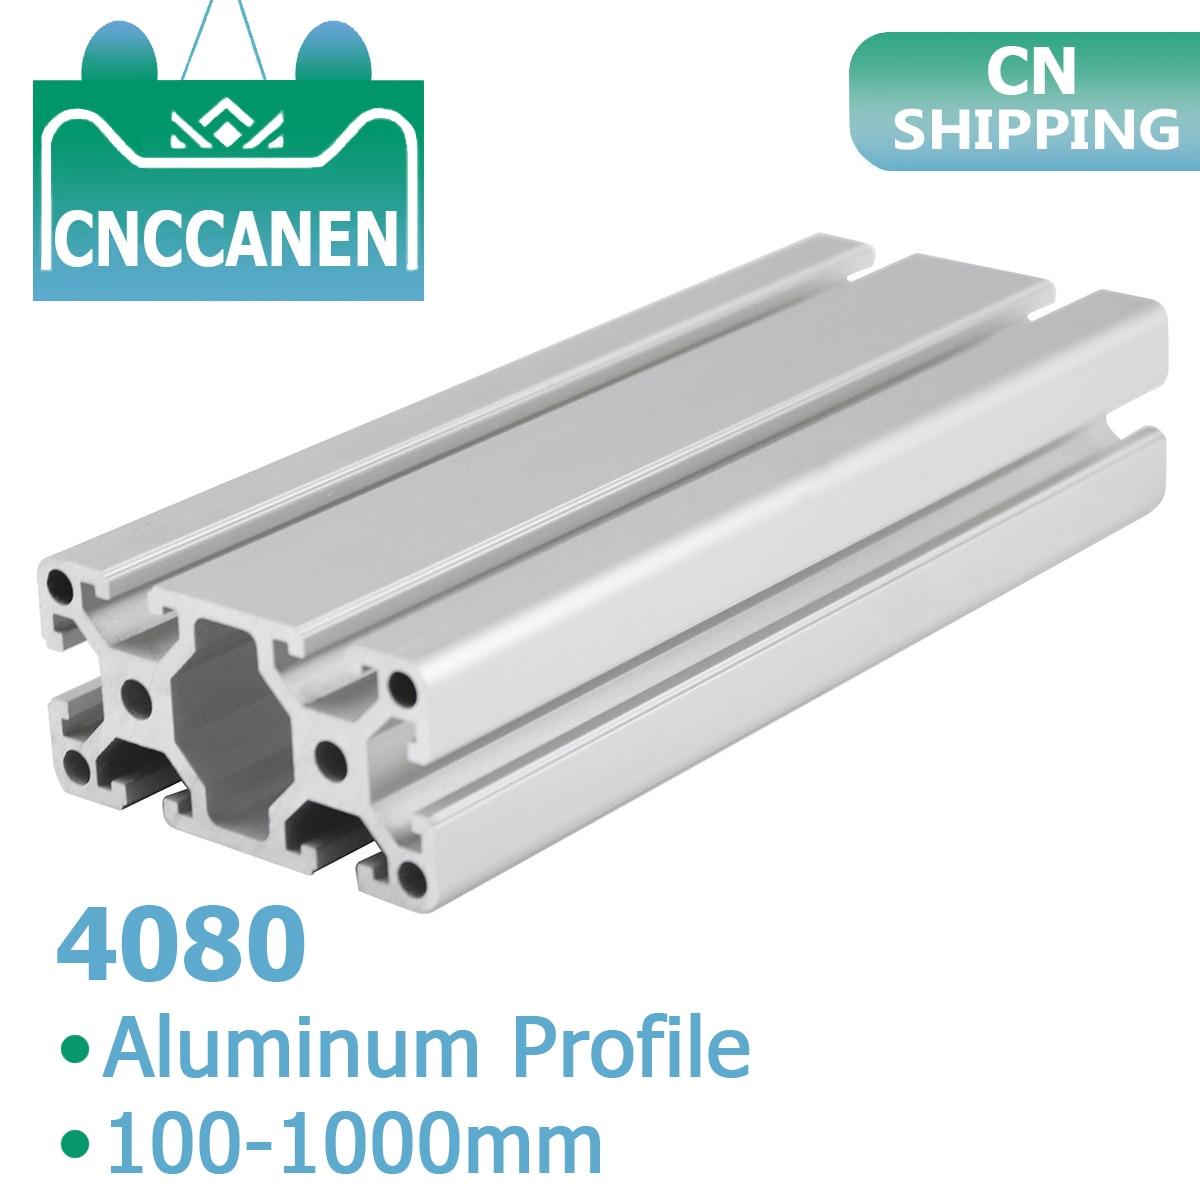 1PC 4080 Aluminum Profile Extrusion 4080 100 - 1000mm Length European Standard Anodized Linear Rail For DIY CNC 3D Printer Parts